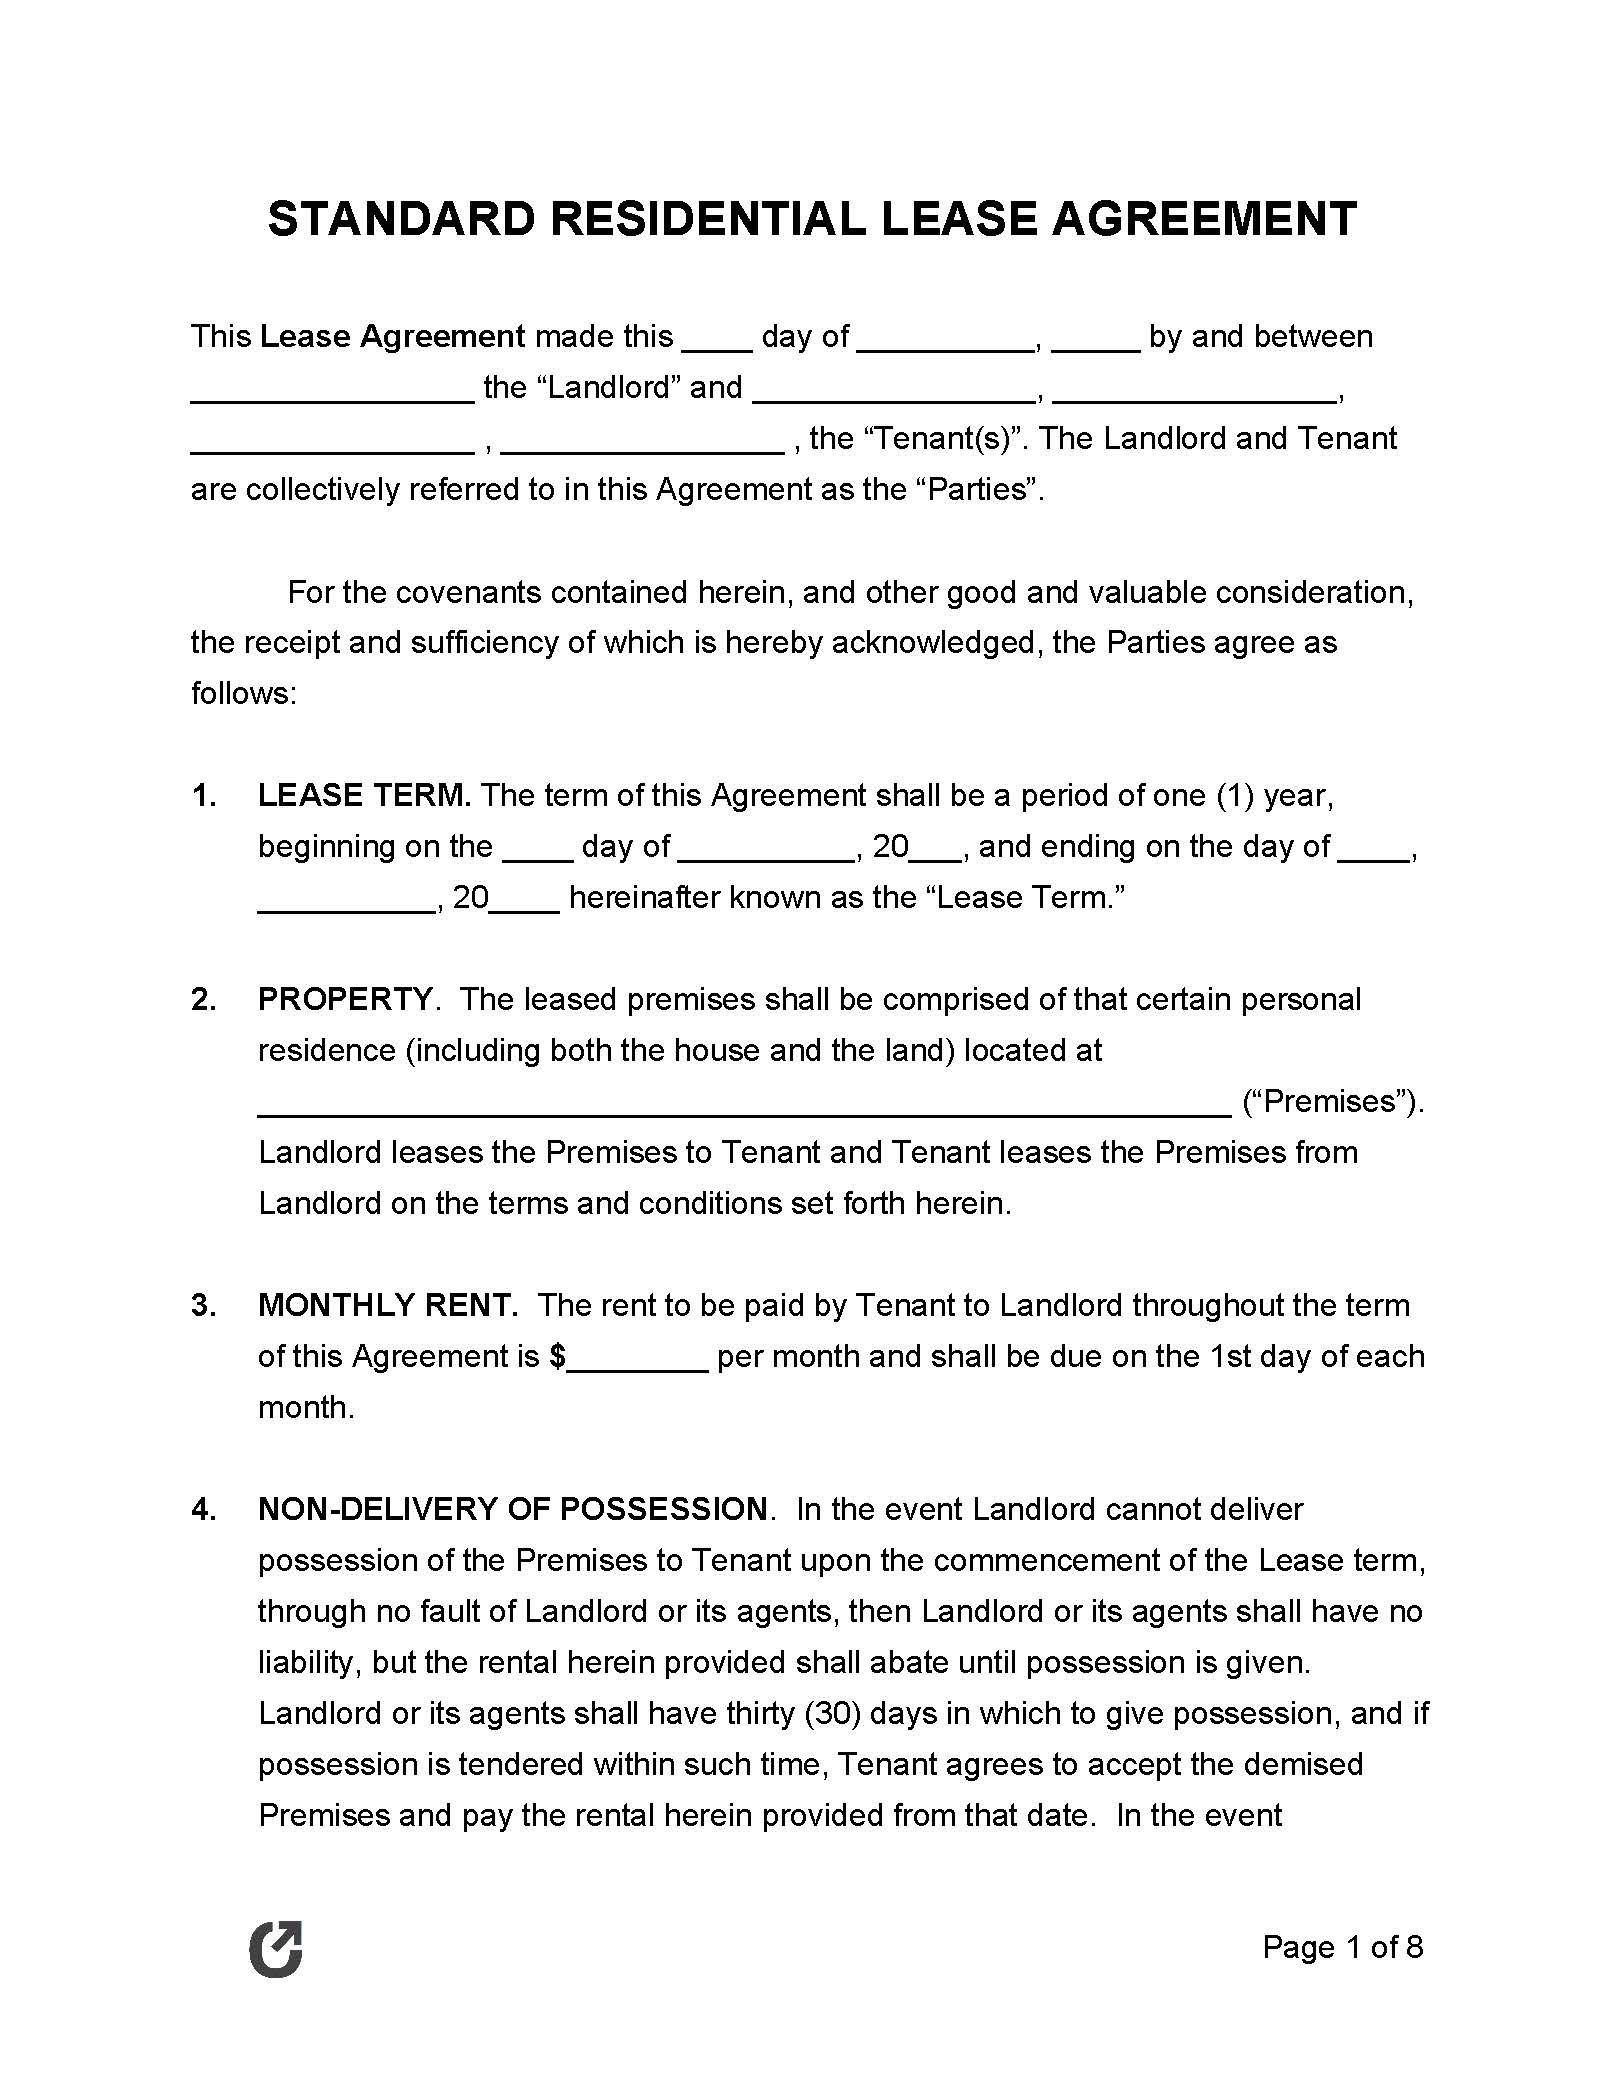 007 Imposing Landlord Contract Template Free Image  Rental Simple Flat Resident Tenancy AgreementFull